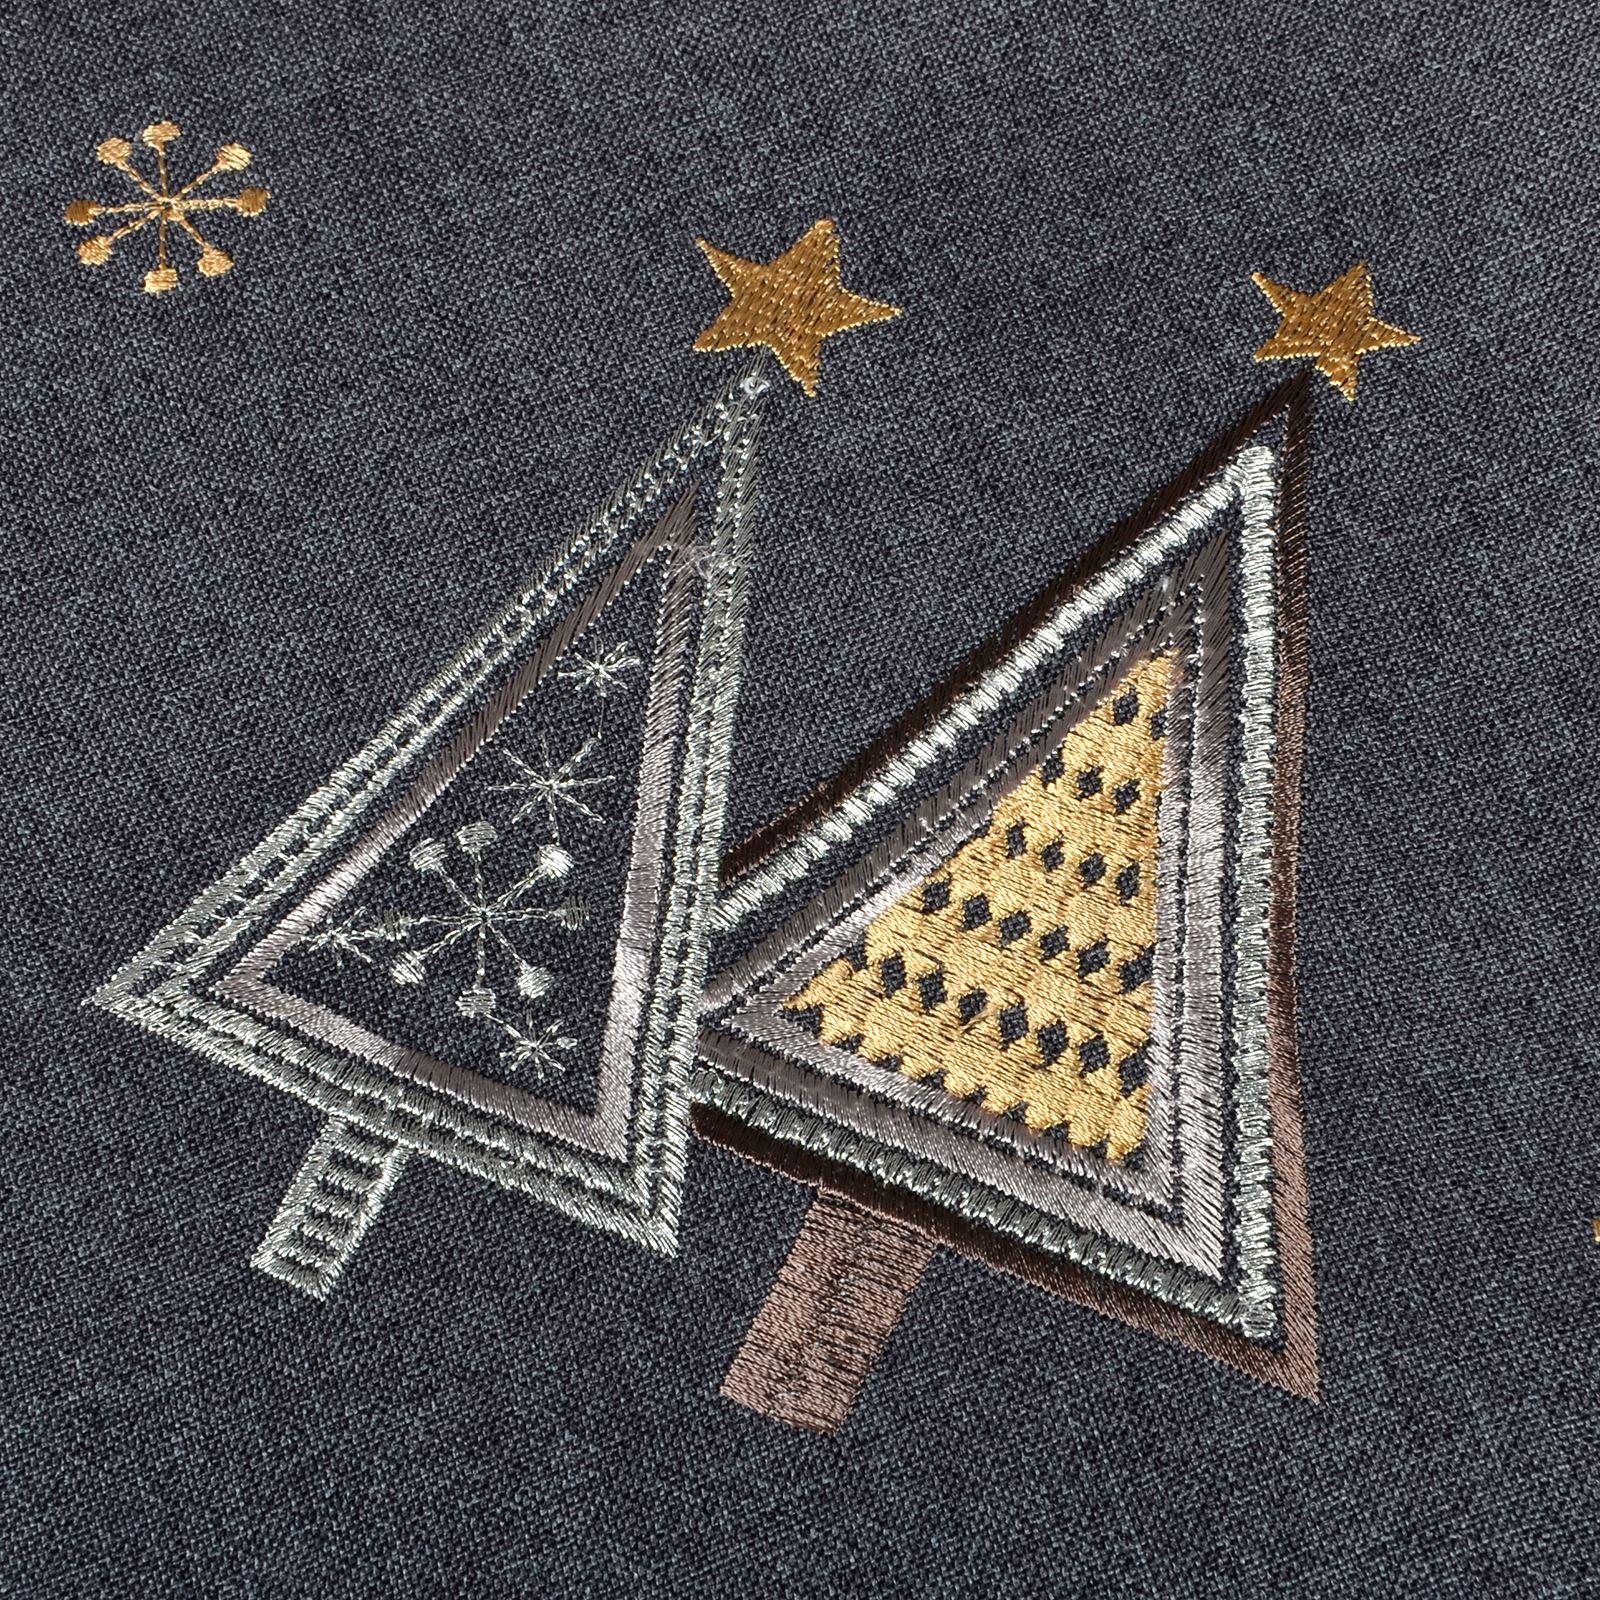 Christmas-Tablecloth-Festive-Pattern-Rectangle-Round-Fabric-Xmas-Room-Decoration Indexbild 18